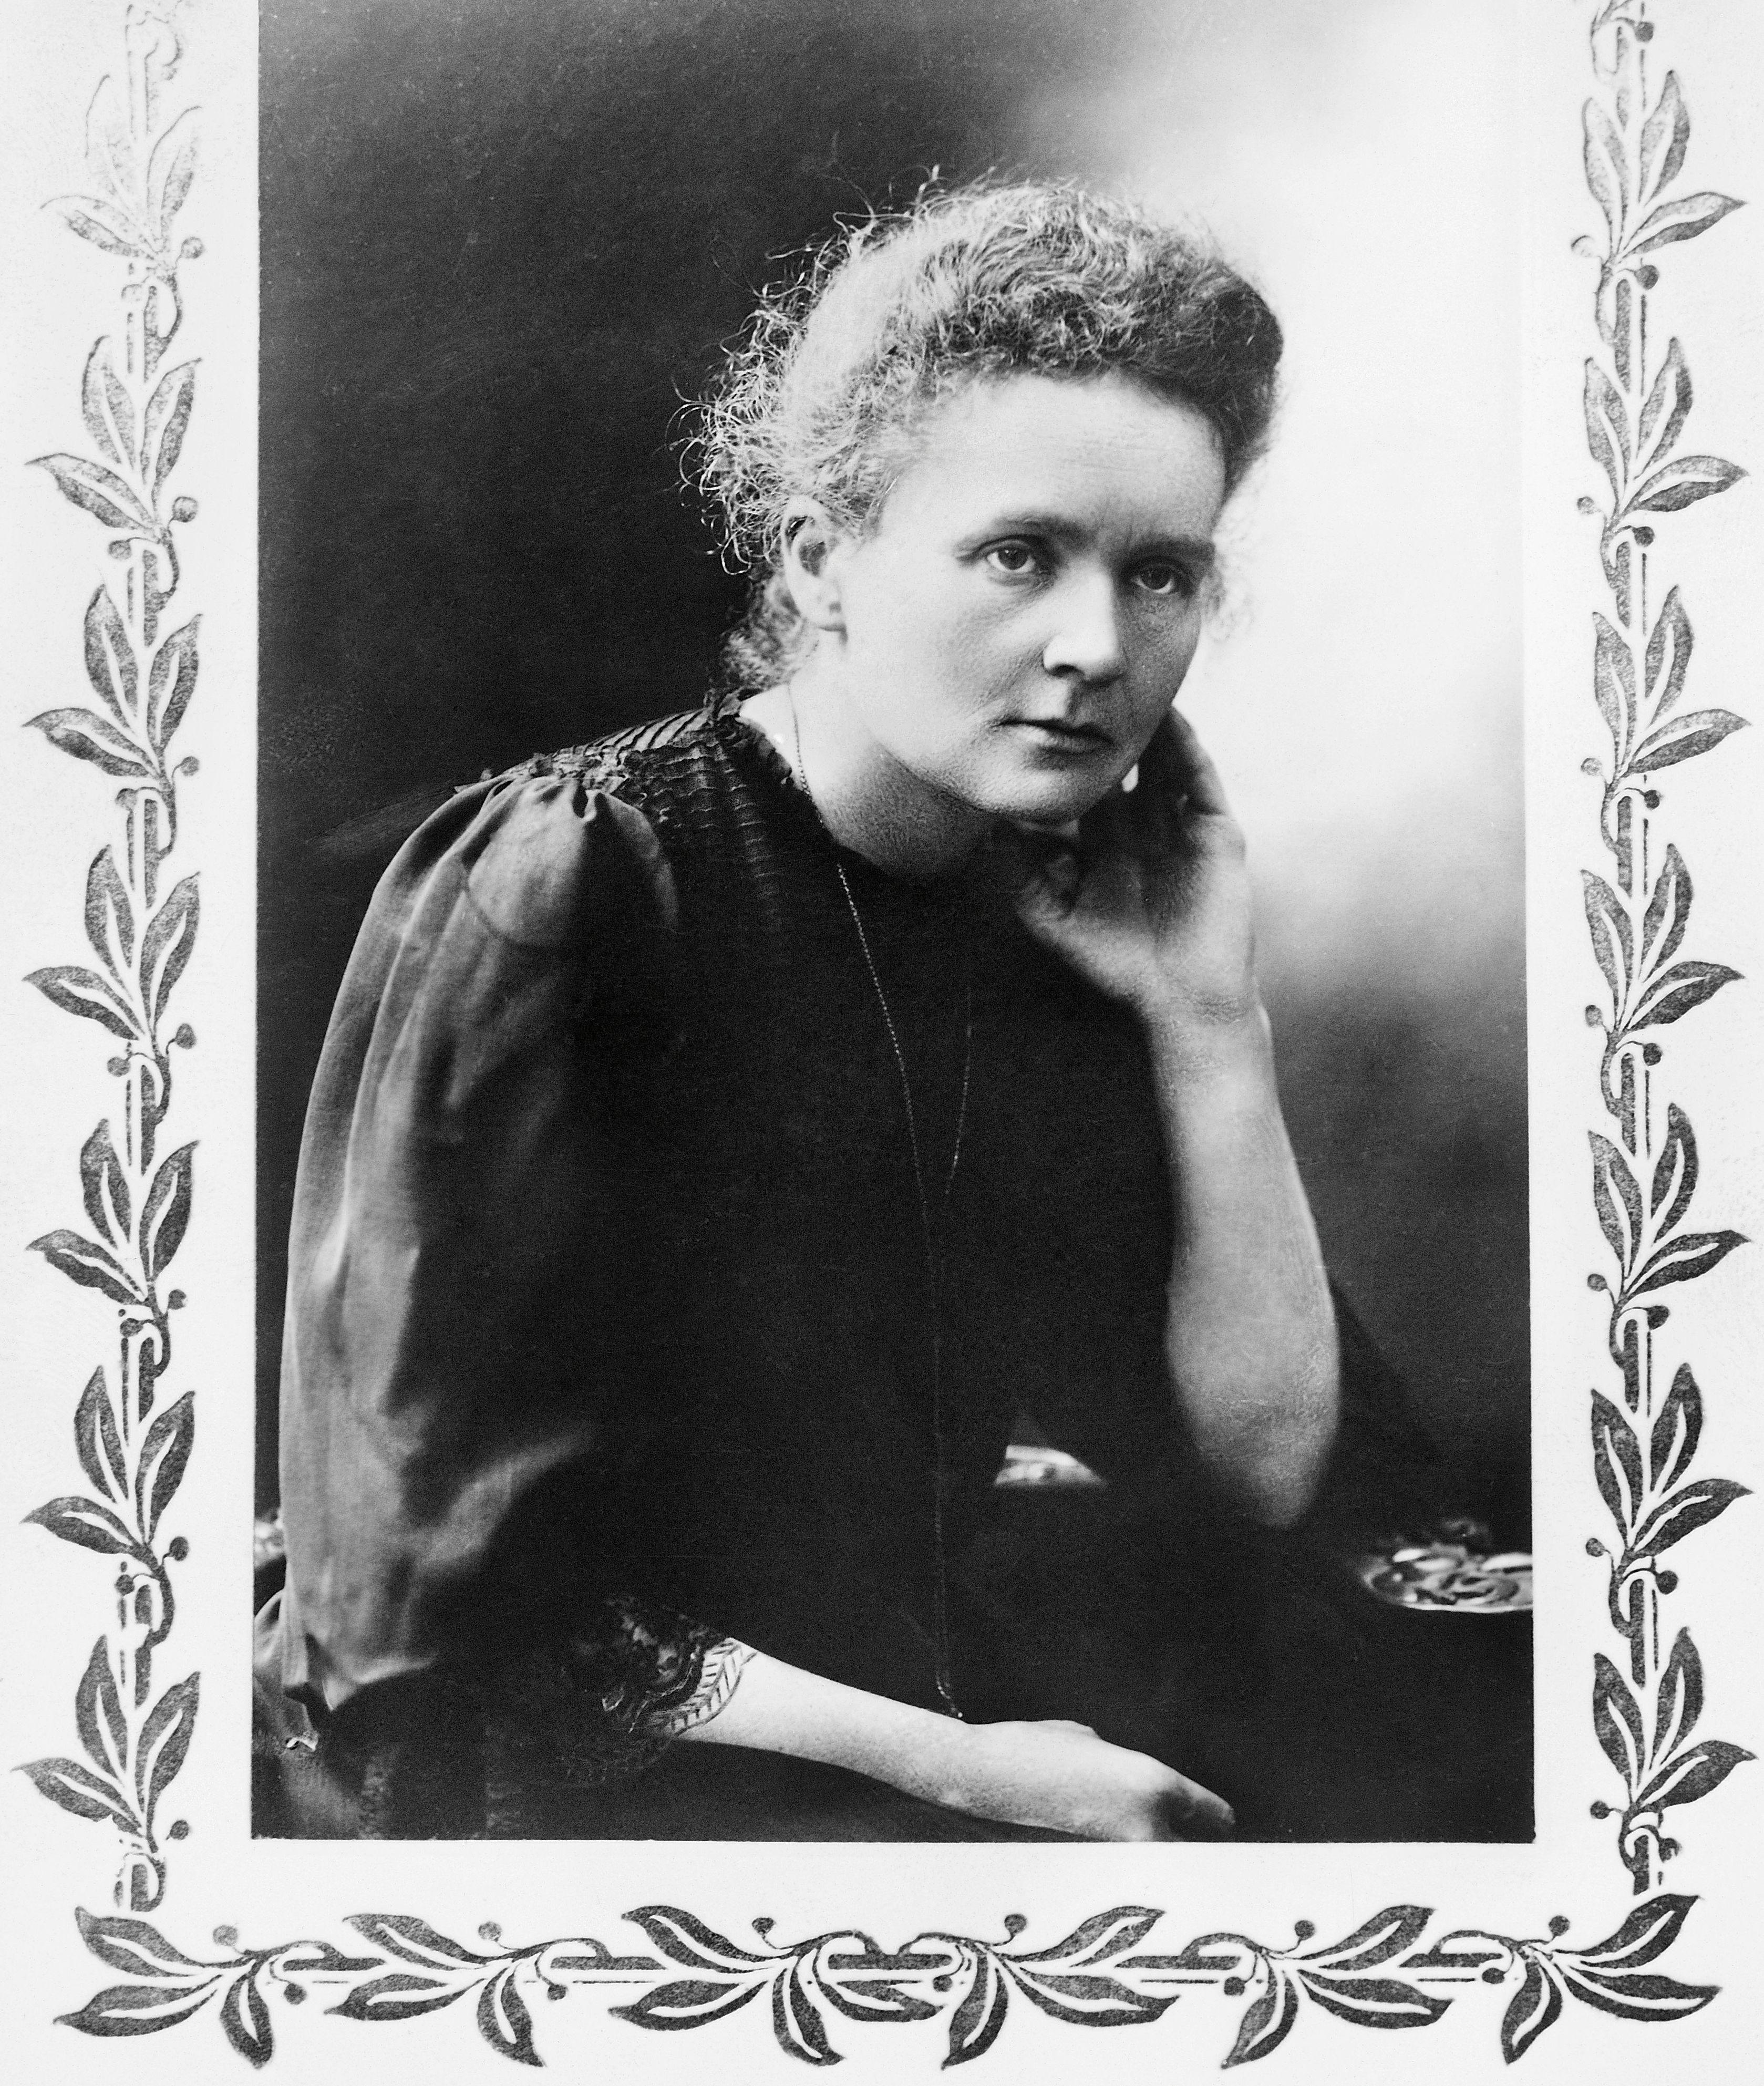 Marie Sklodowska Curie - 1867 to 1934